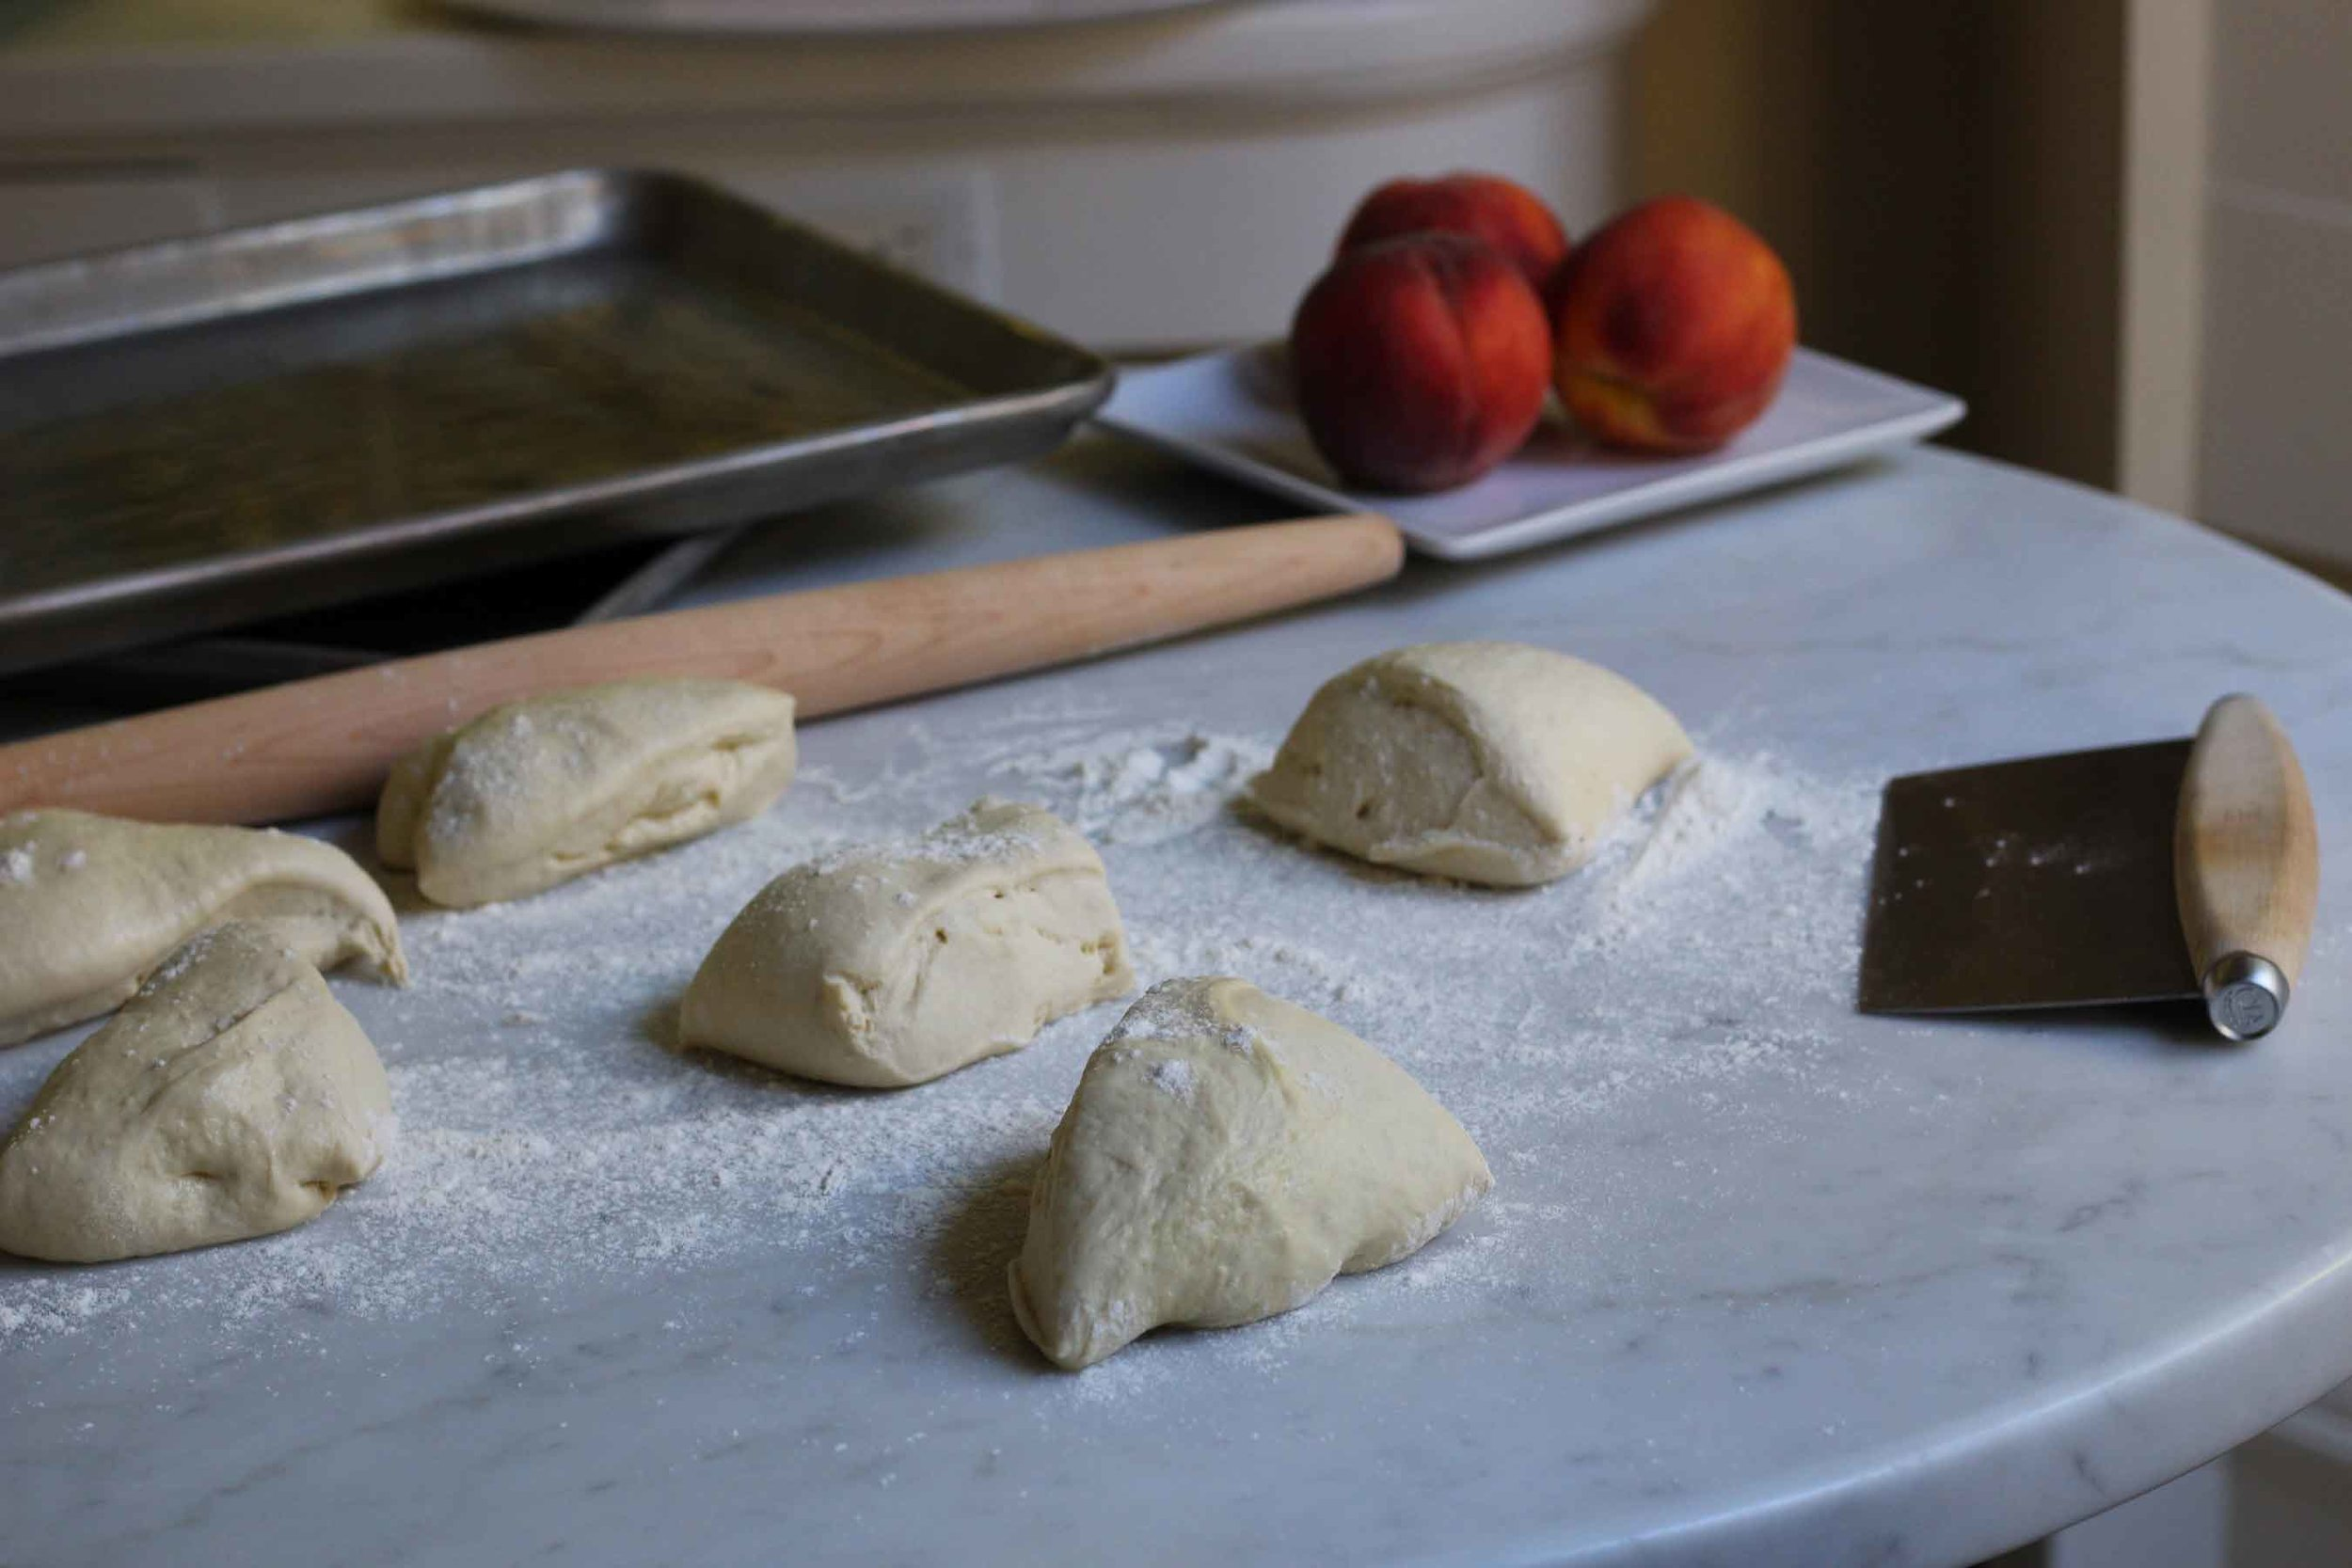 Cutting homemade pizza dough